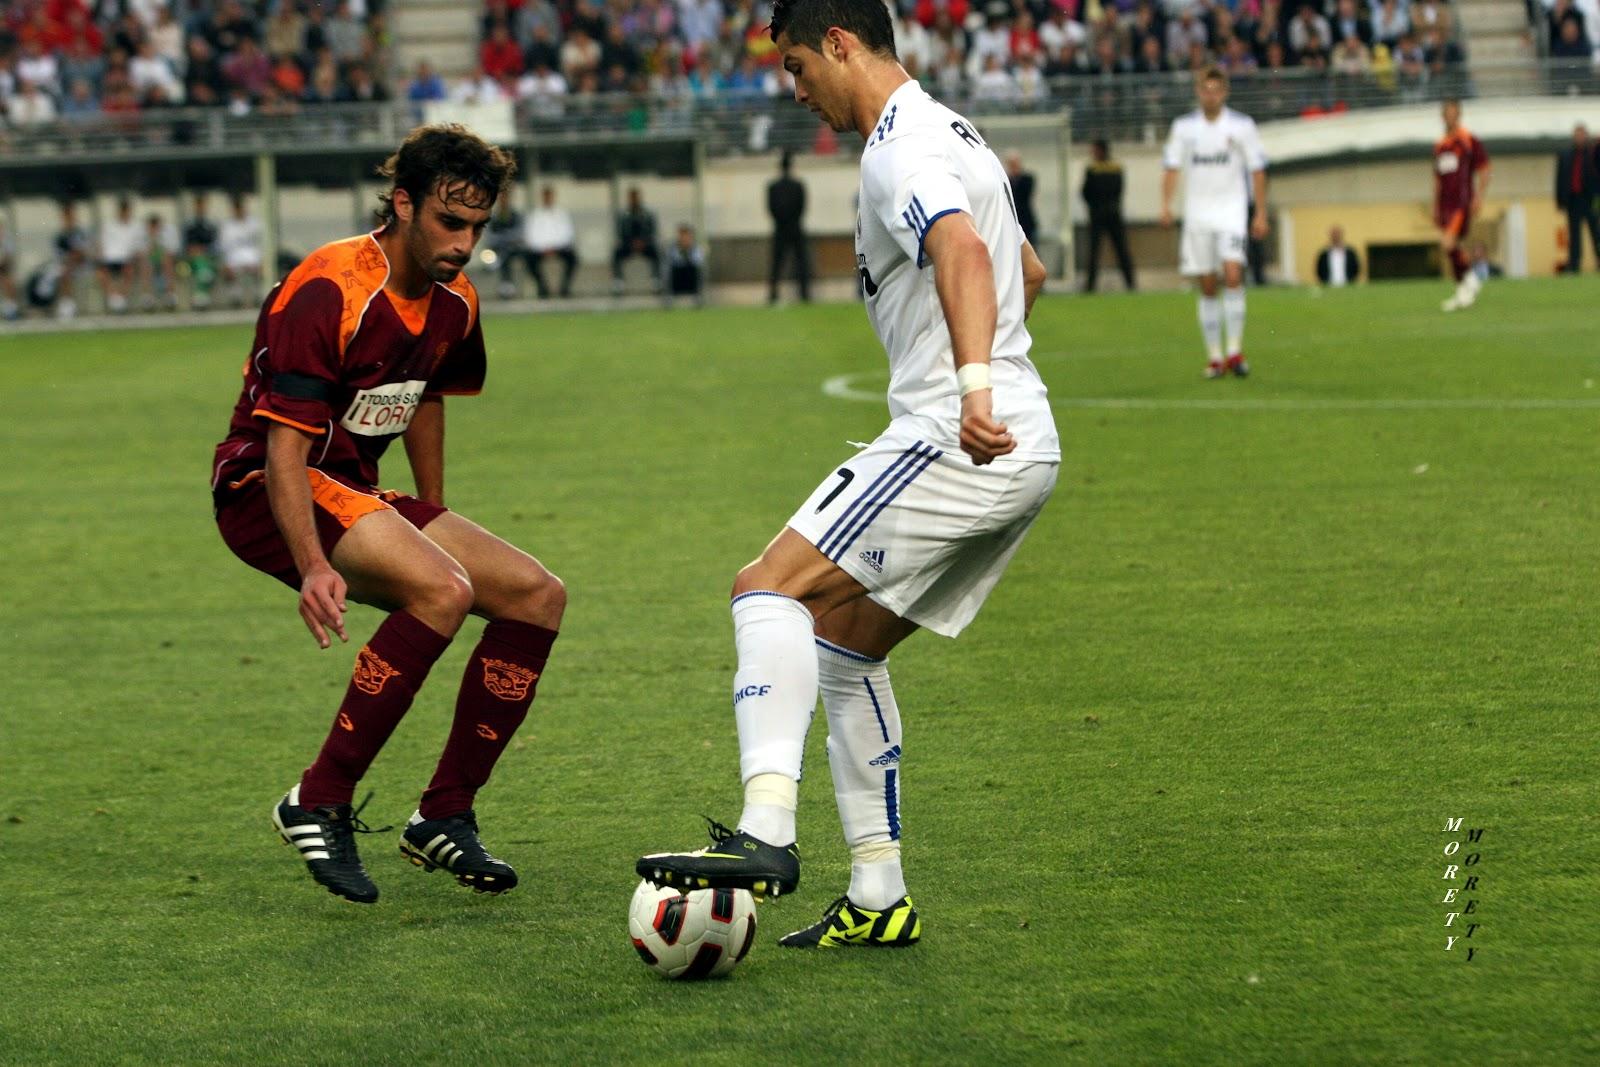 http://1.bp.blogspot.com/-uiGeRSDAX8A/UD-5eW183oI/AAAAAAAAbfI/ykc06KCgMCY/s1600/Urzaiz+Marcando+a+Cristiano+Ronaldo+-+Foto+Morety+-+Murcia+seleccion+2+Vs+Real+Madrid+2+-+19+-5+-+11+975.jpg